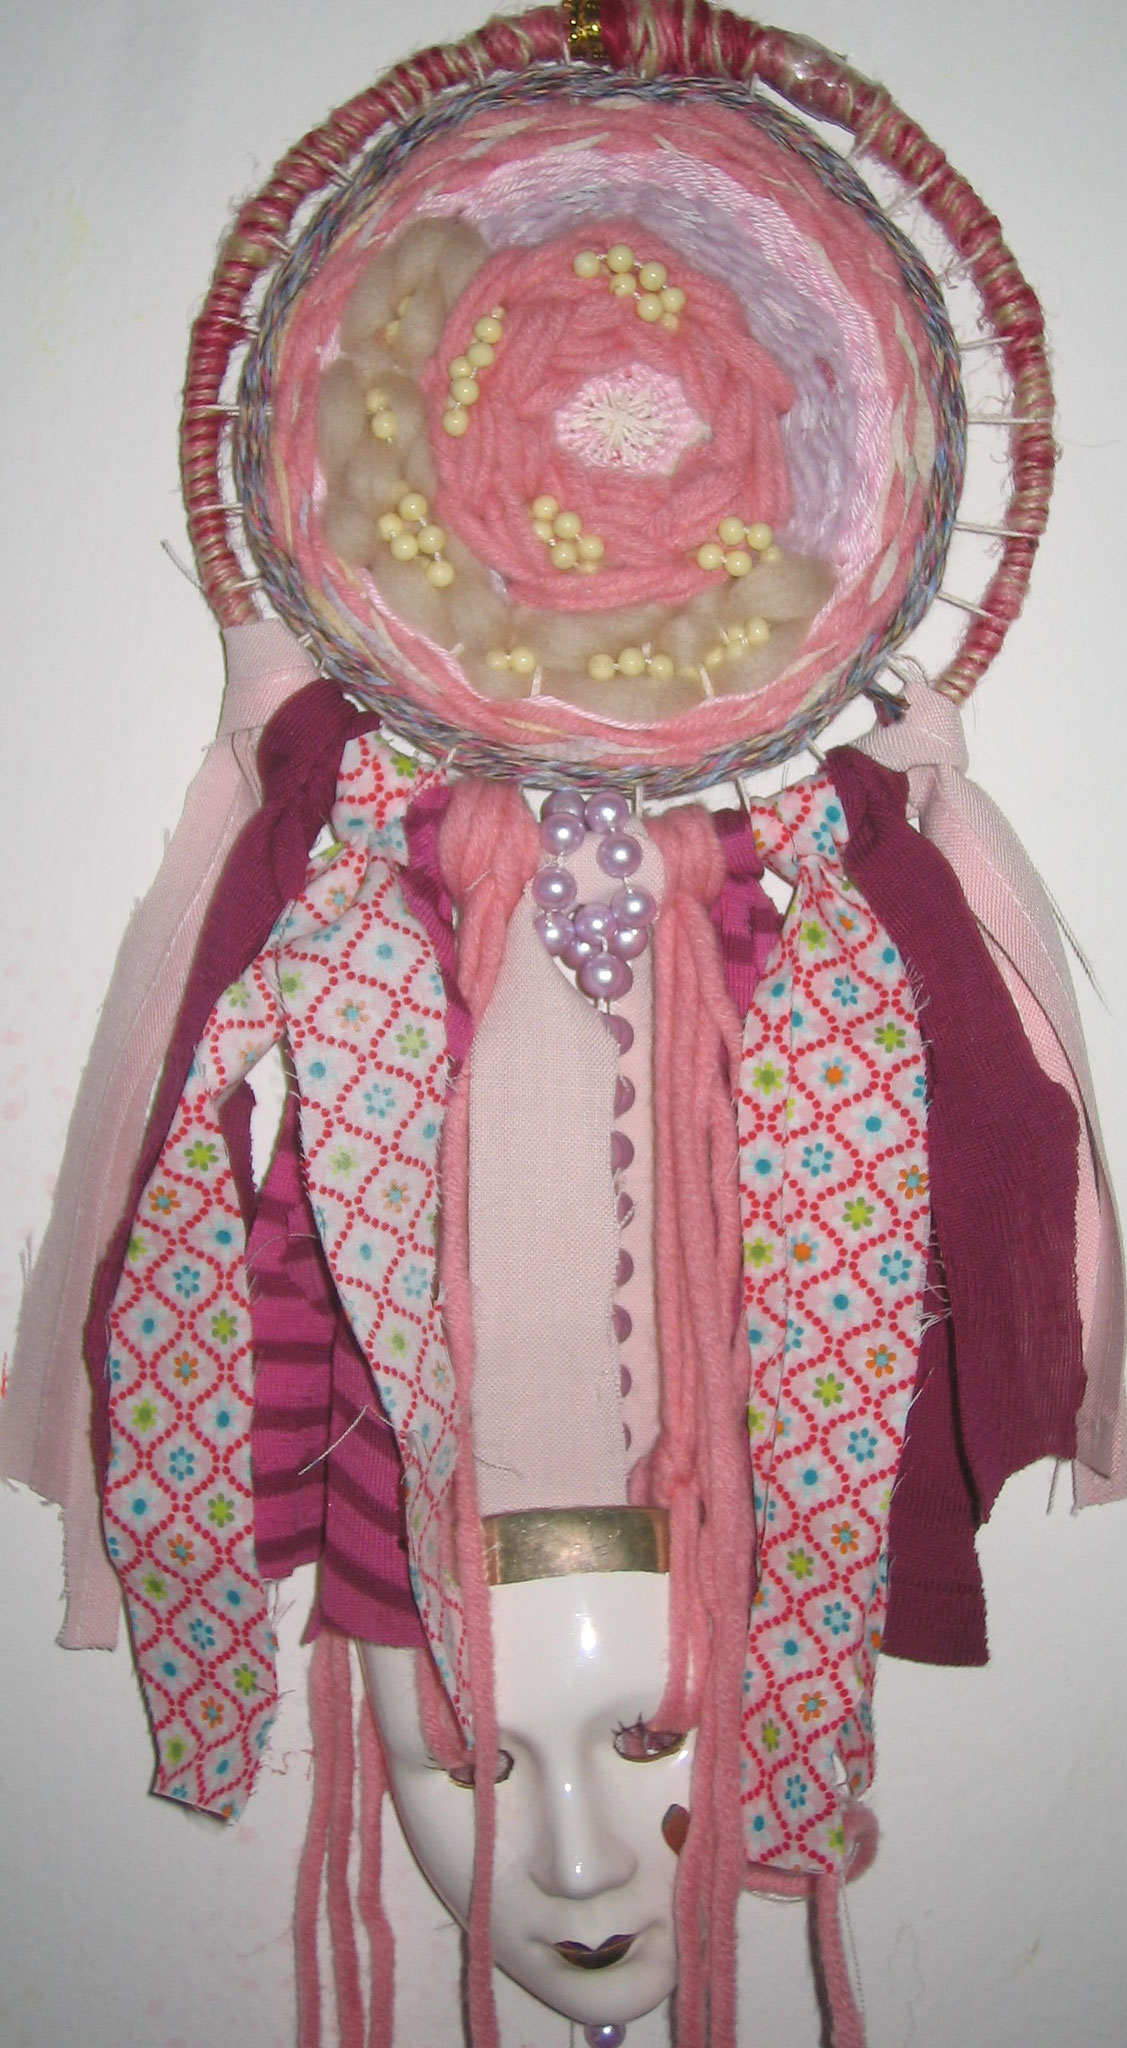 Mask of Dreams (Weberei aus verschiedenen Textilien)